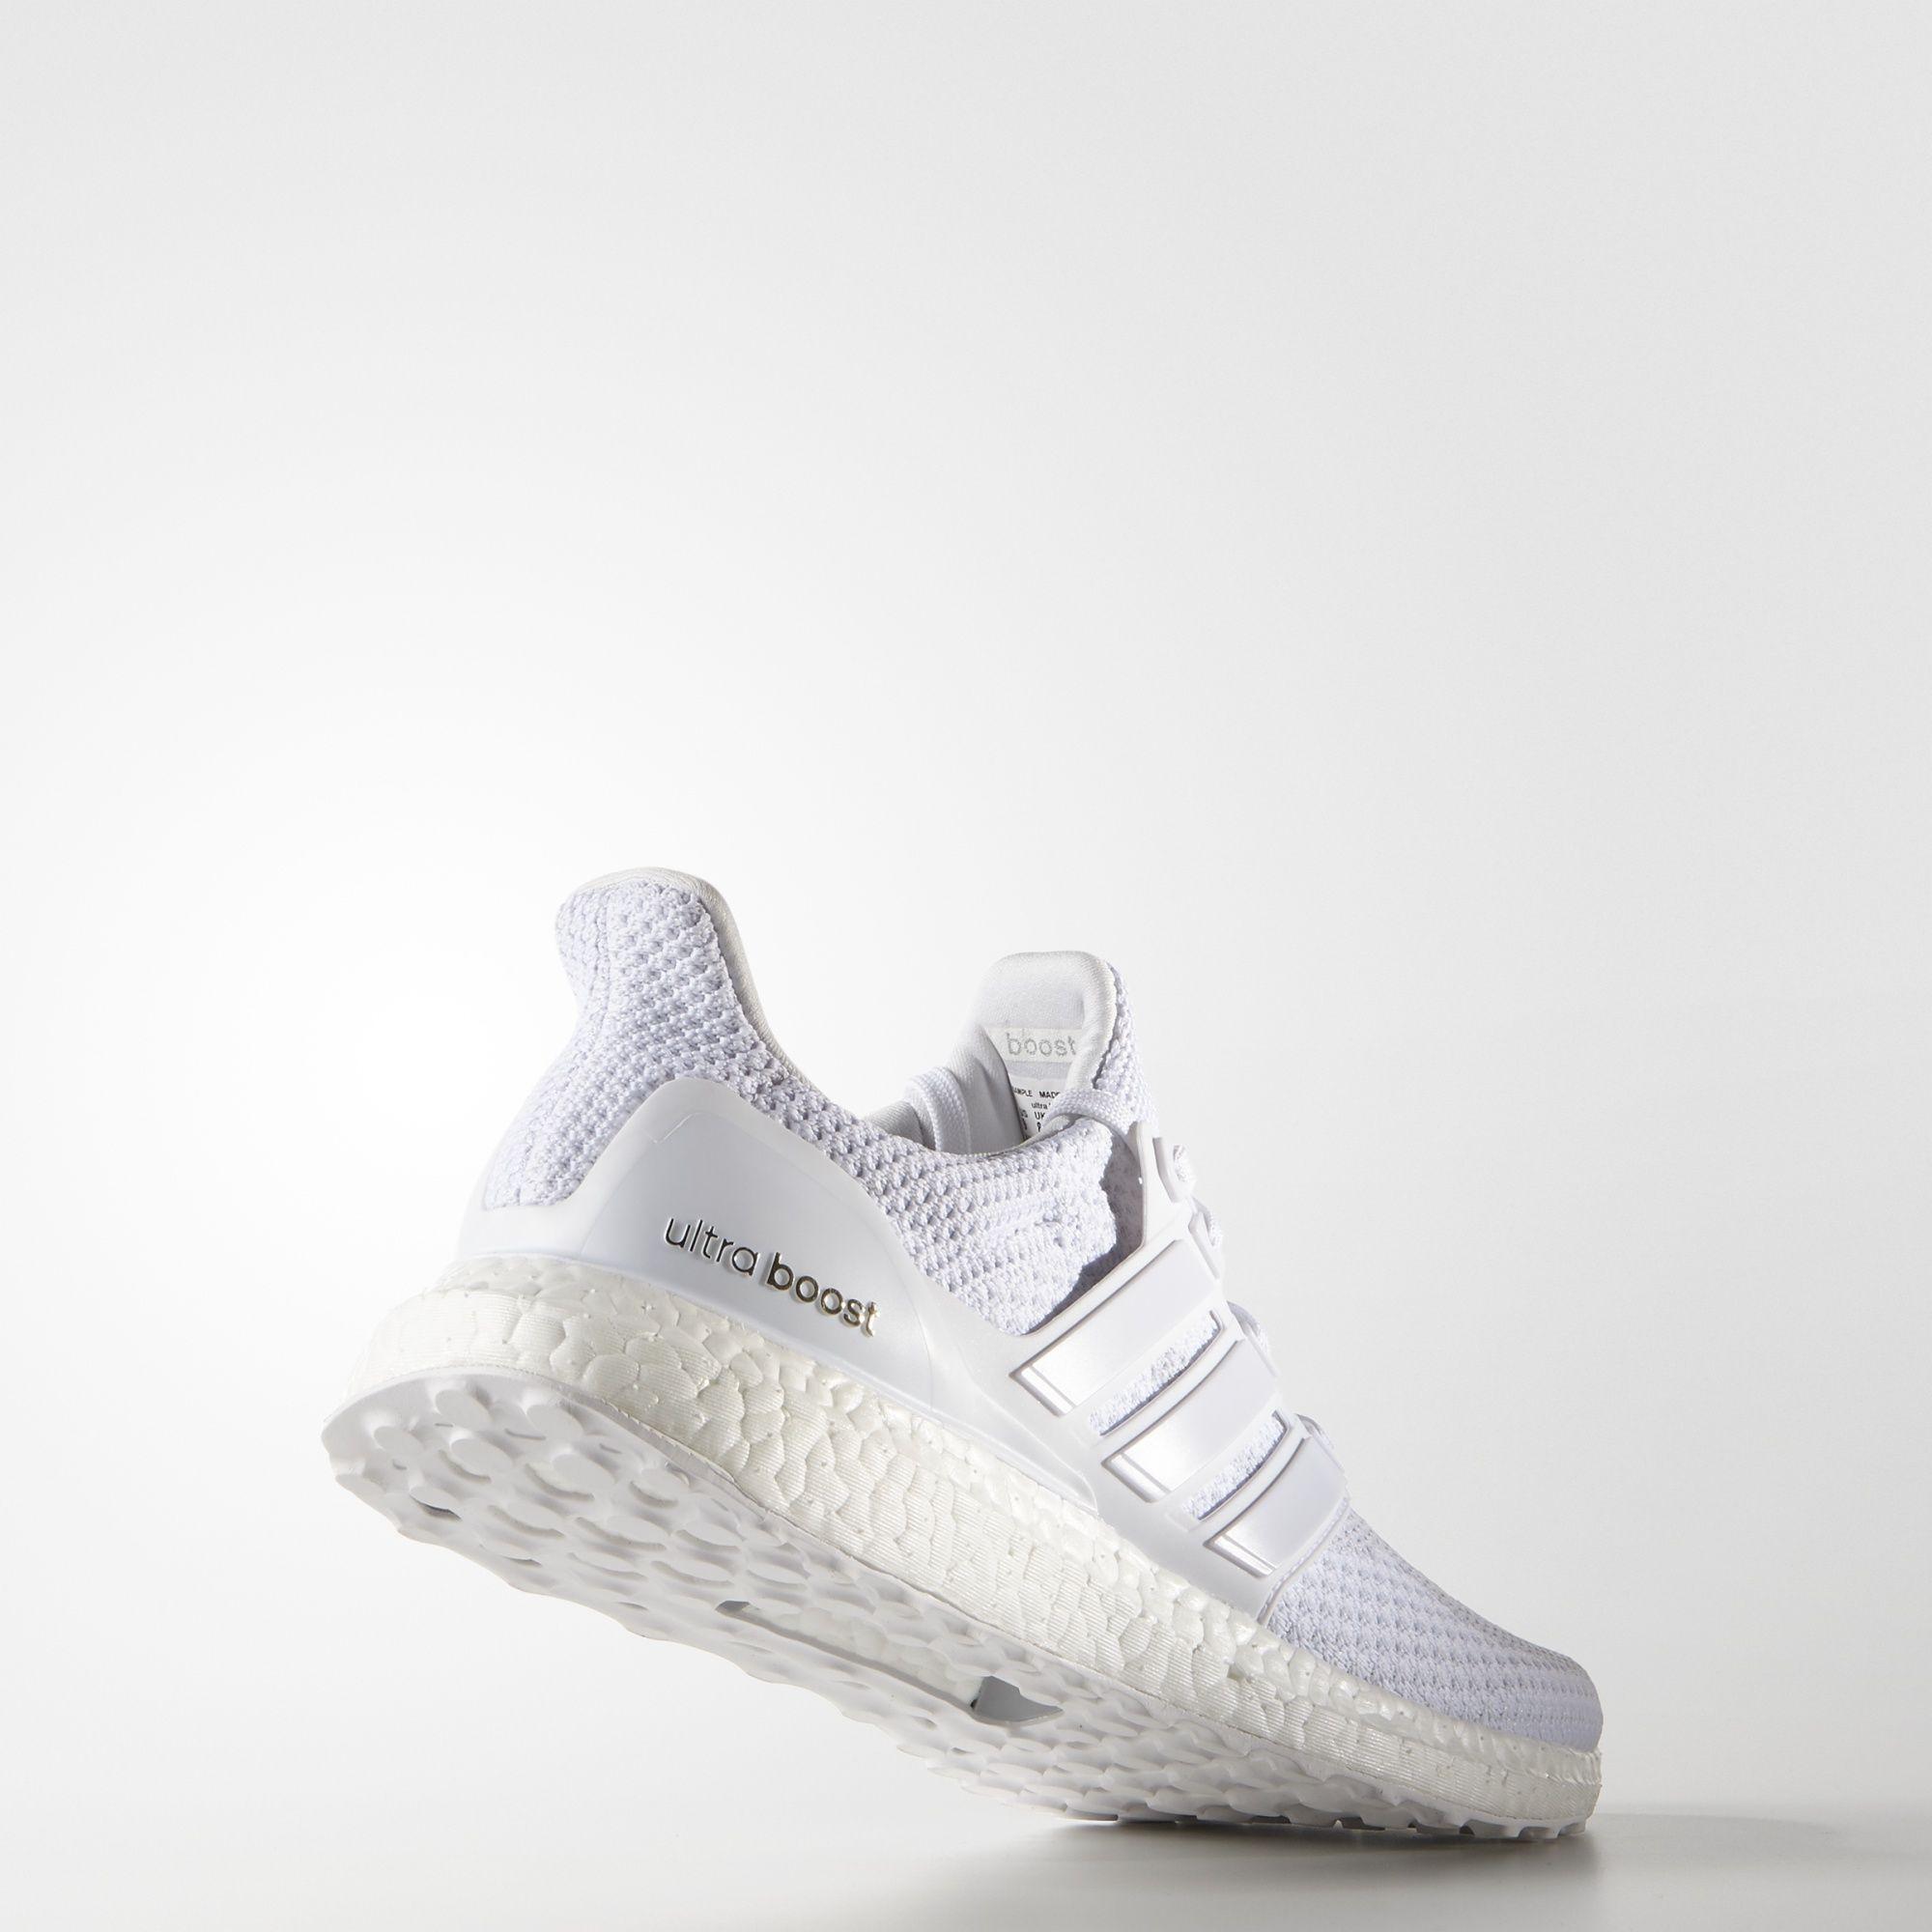 adidas Ultra Boost 2 0 Triple White AQ5929 2